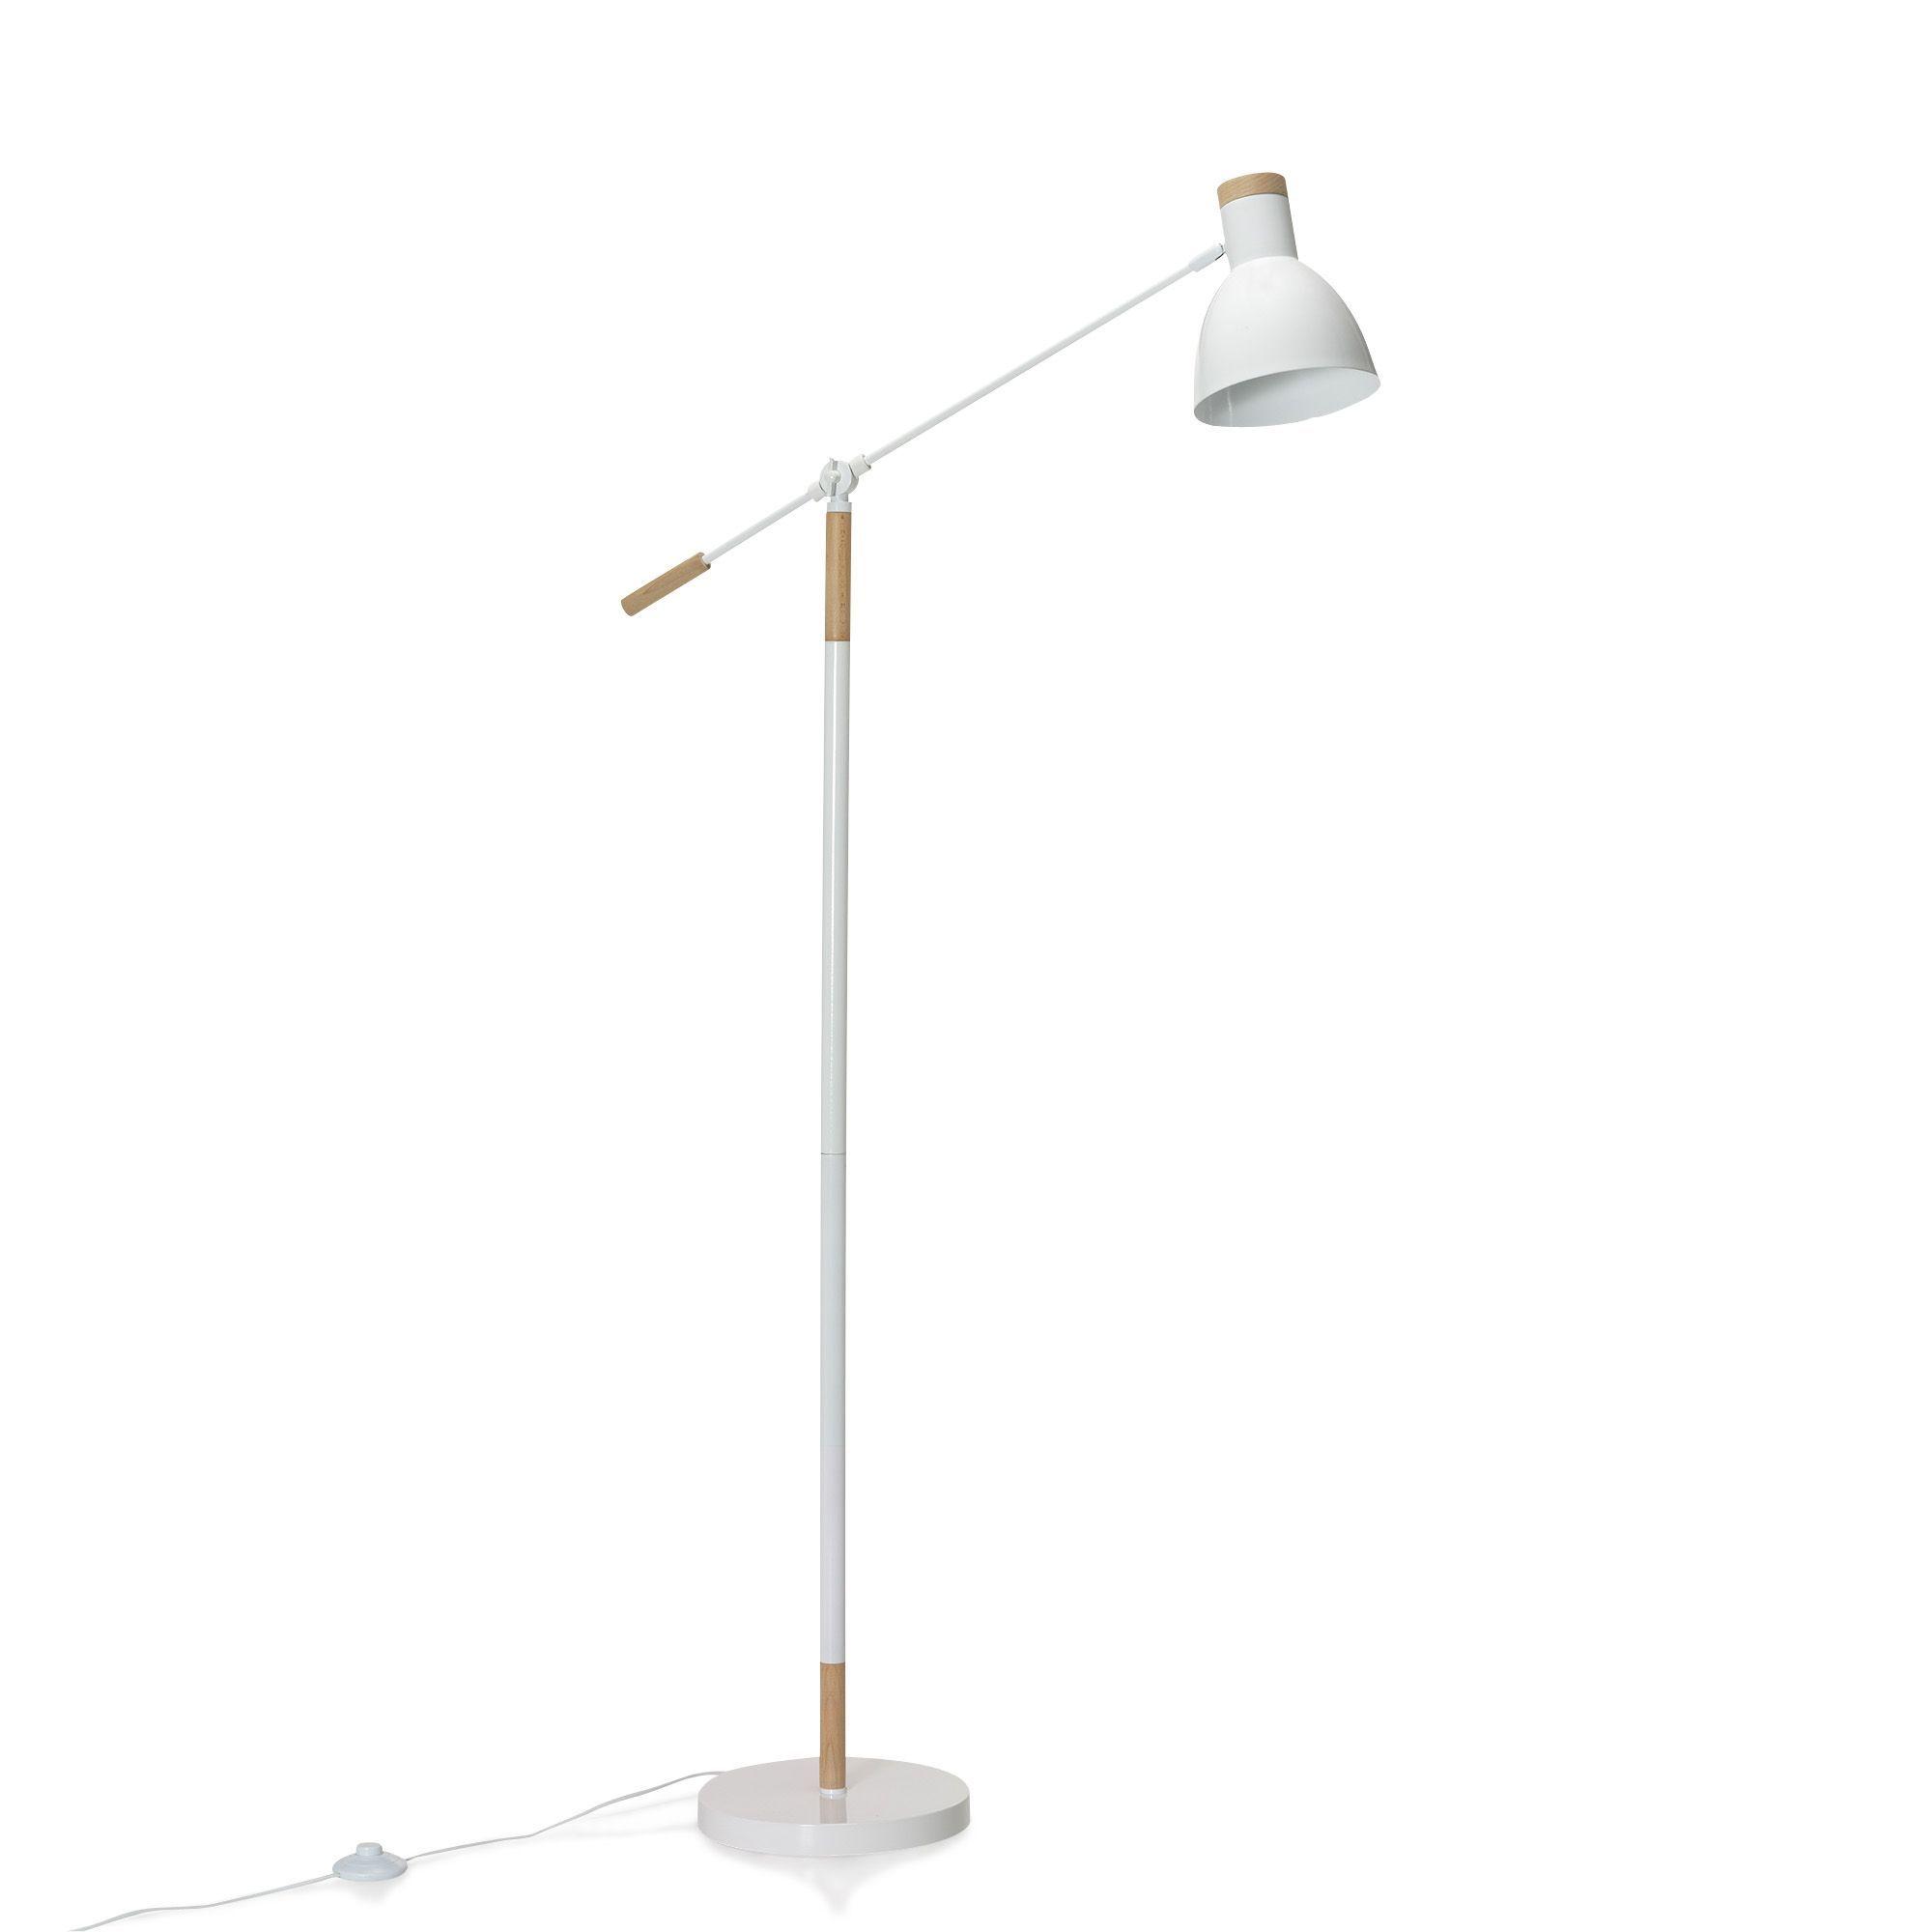 Lampadaire style scandinave H156cm Blanc - Wanda - Les lampadaires ...